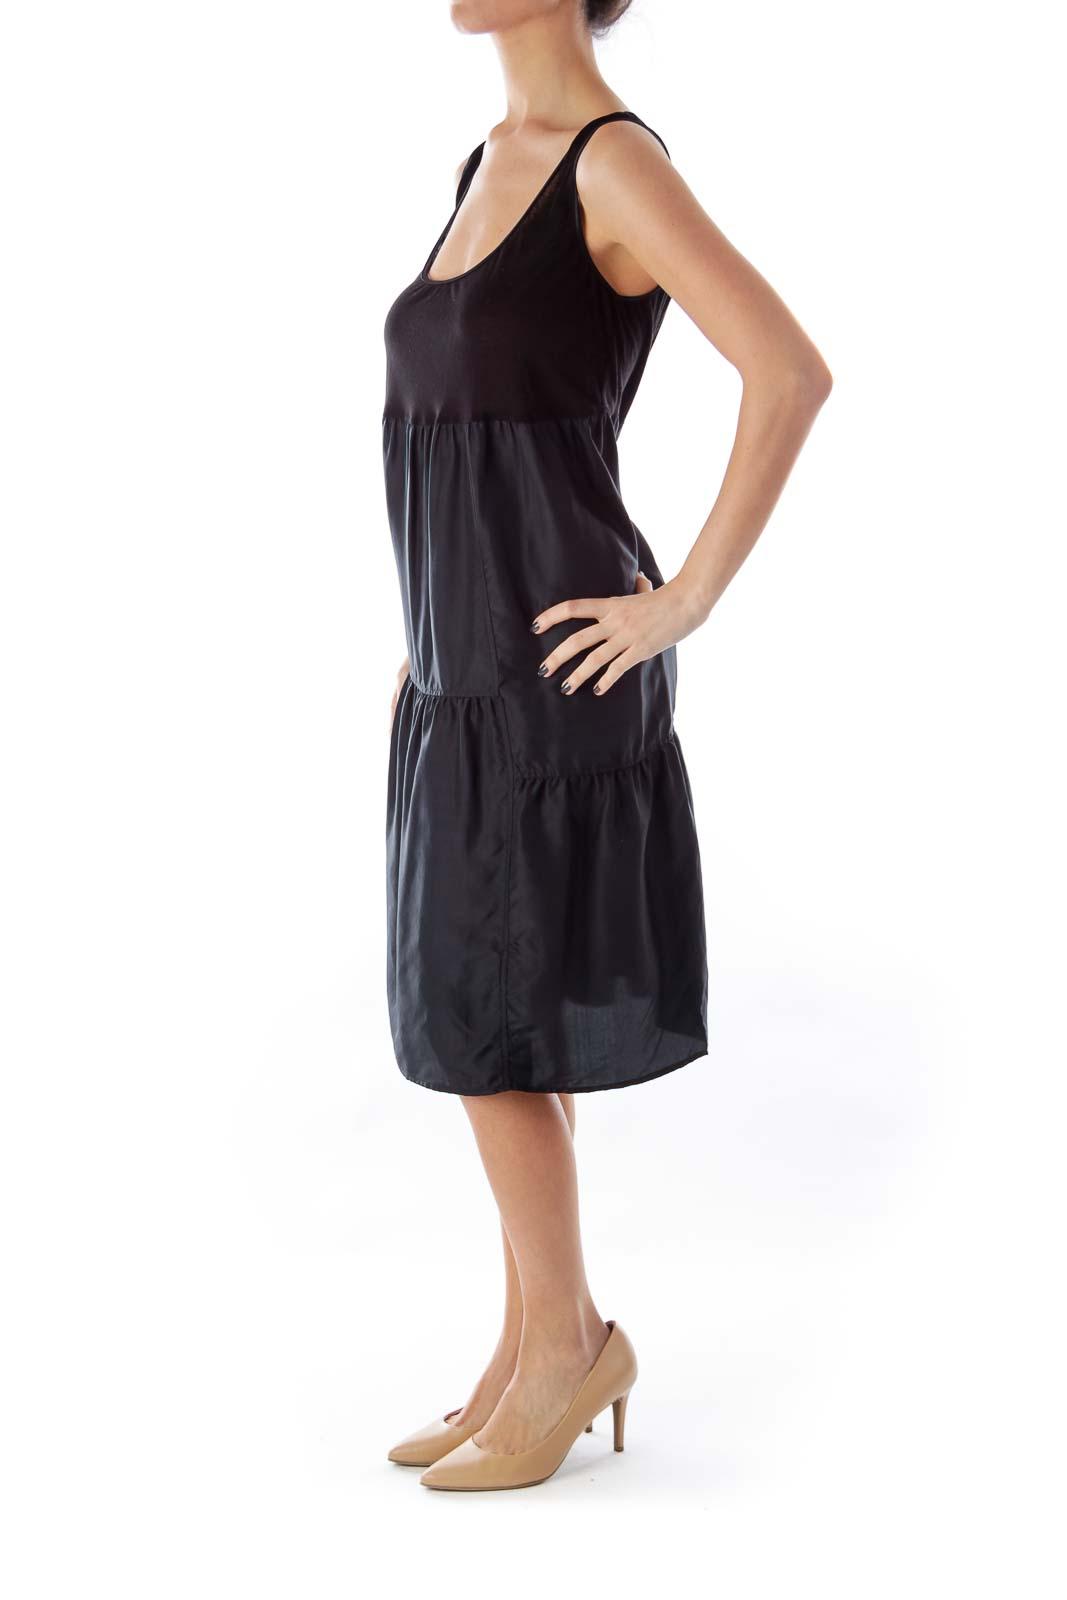 Black Layered Dress